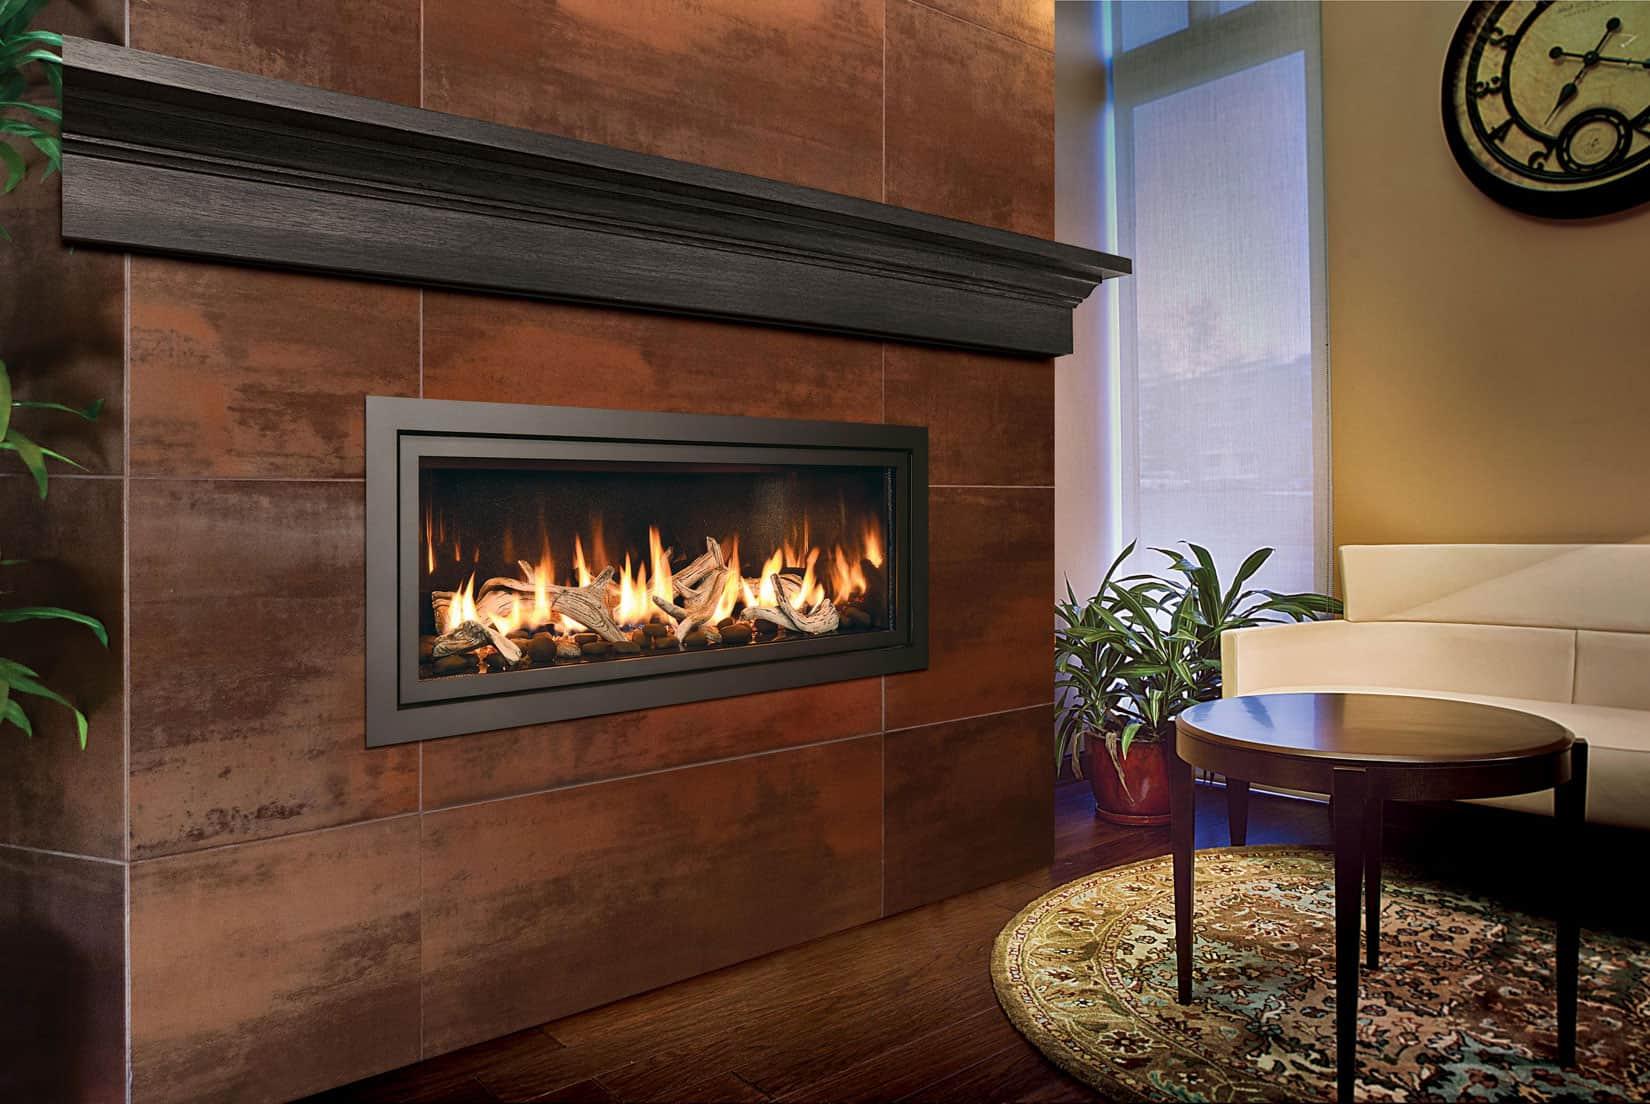 Mendota Fullview Décor Linear Ml 47 Fireplaces Plus Inc